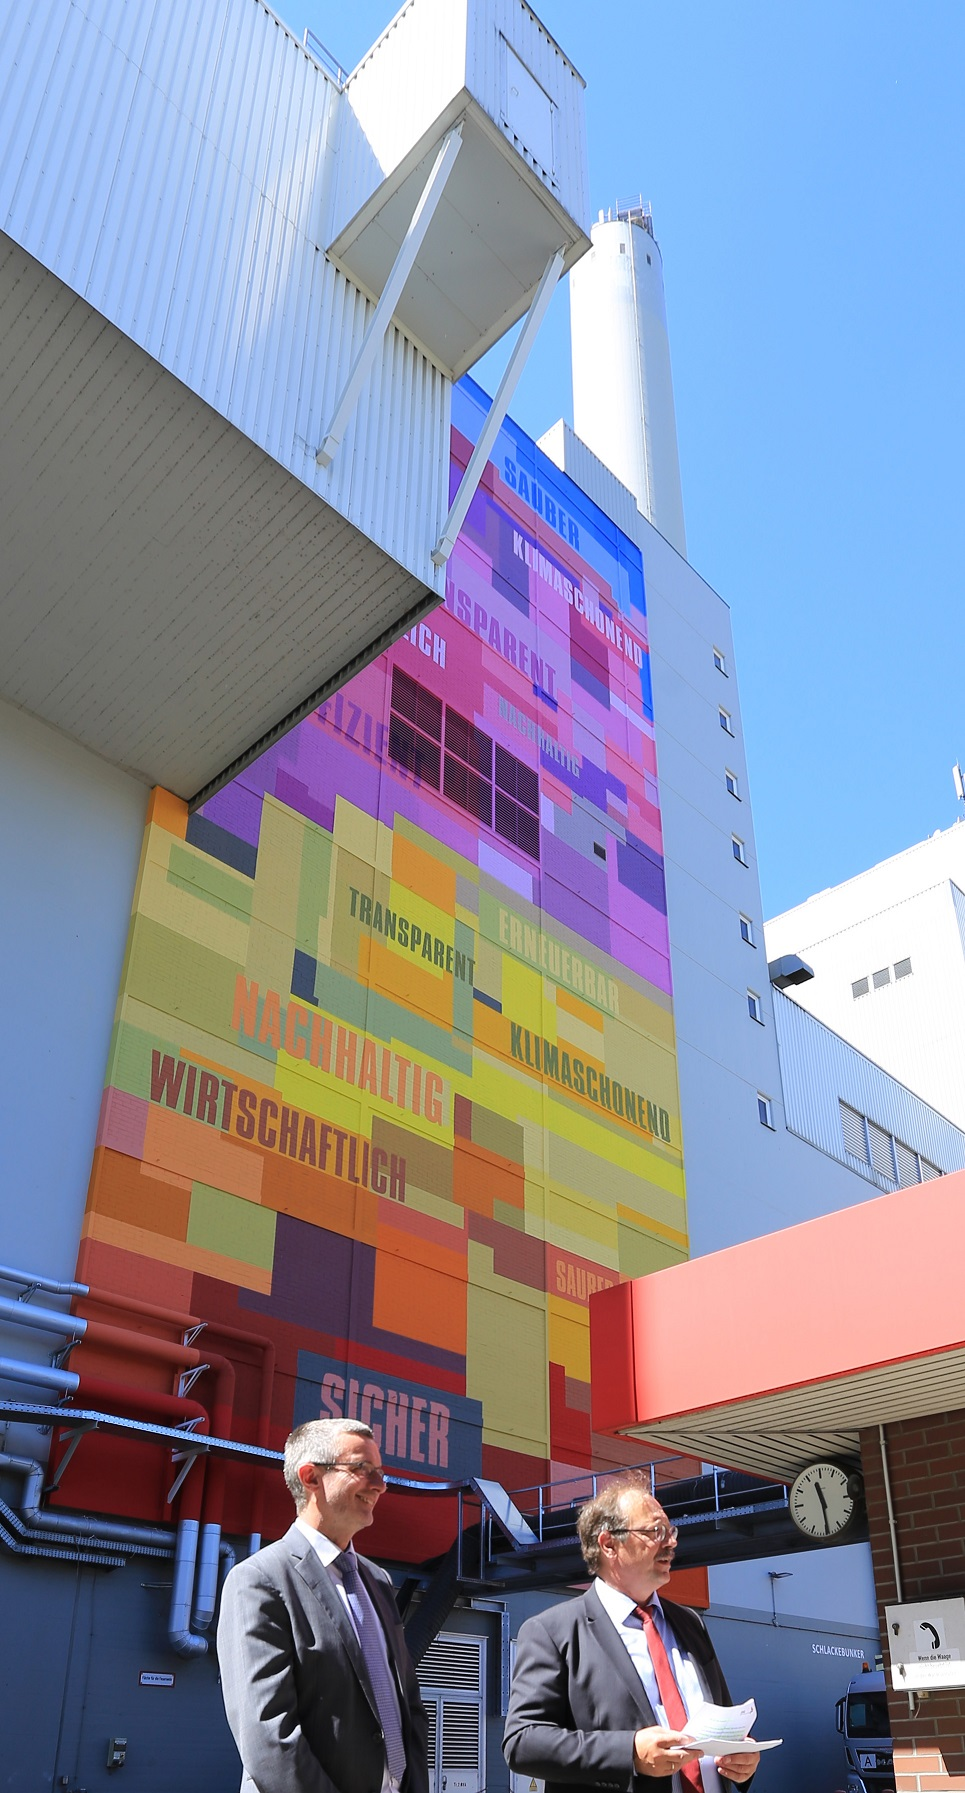 GML_Ludwigshafen_Wandbild_Fassadenbild_Industrie